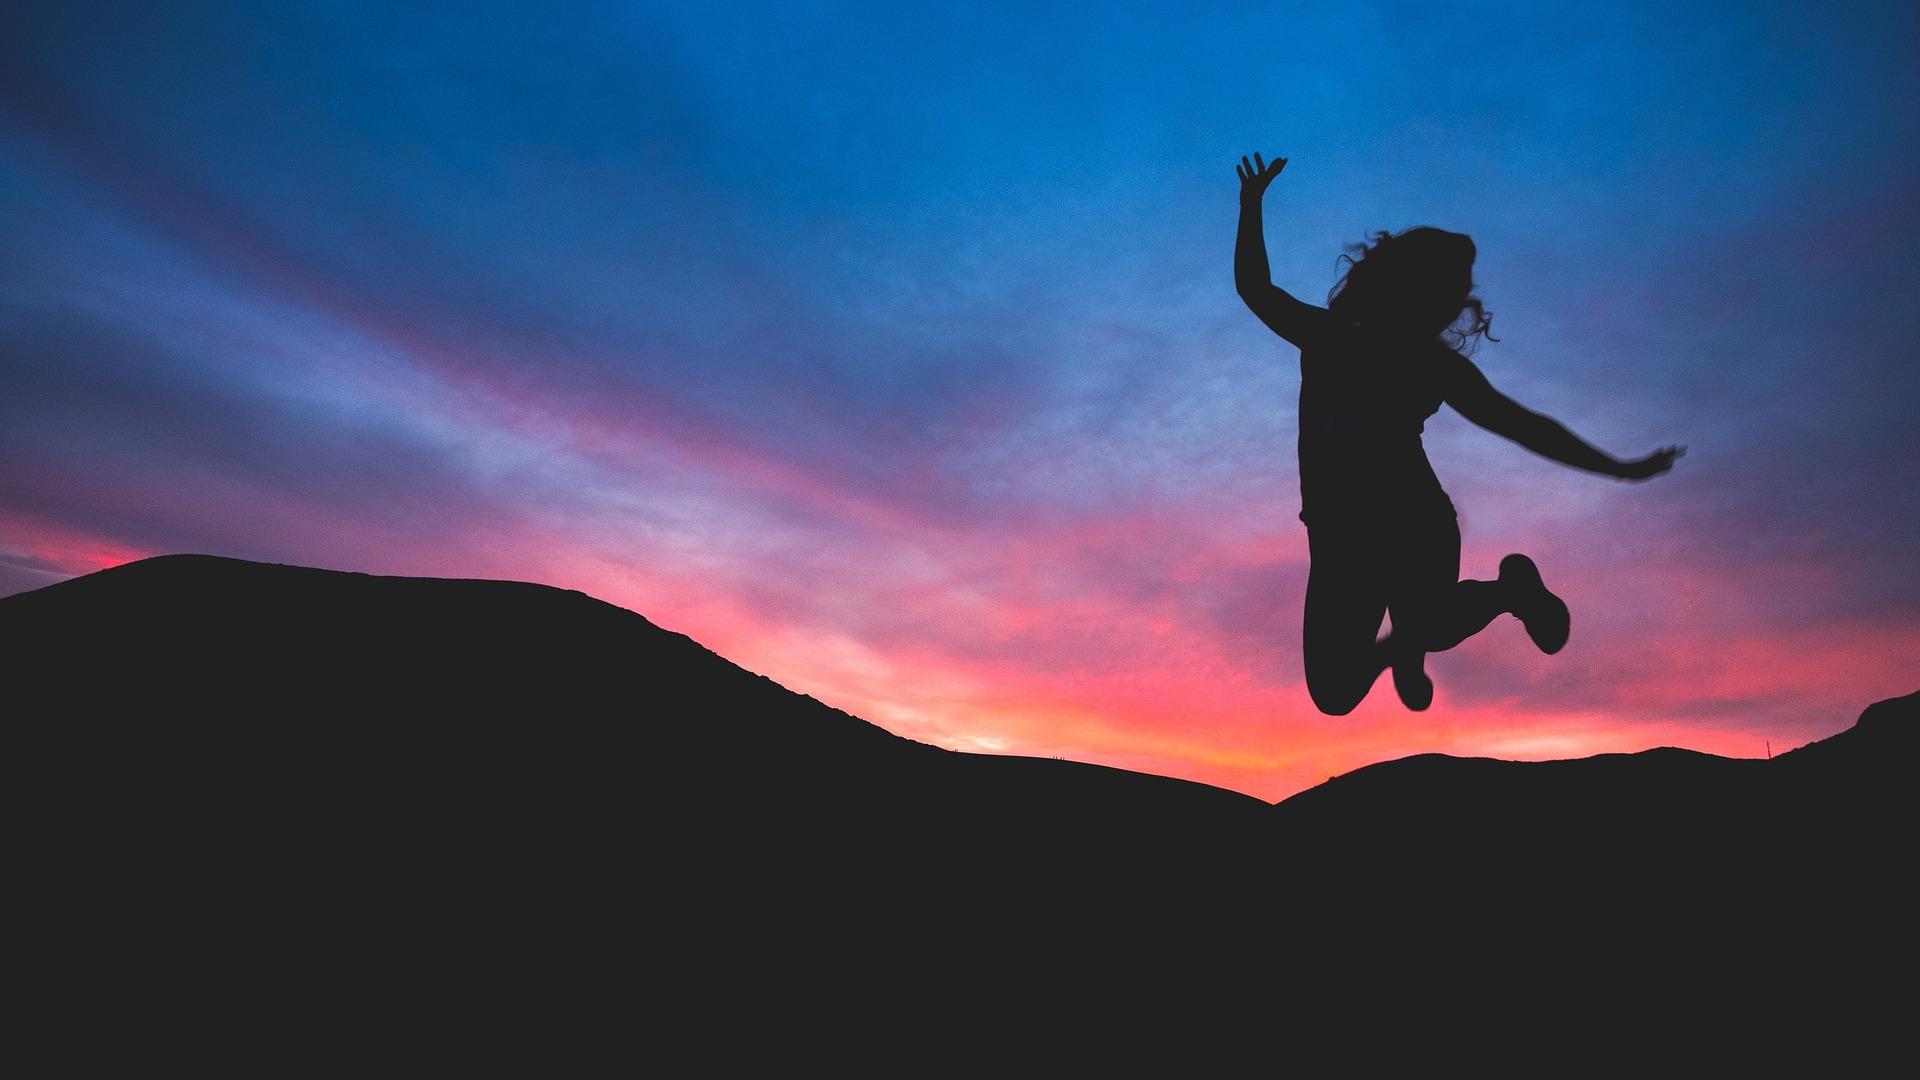 Girl jumping - meditation mini retreat